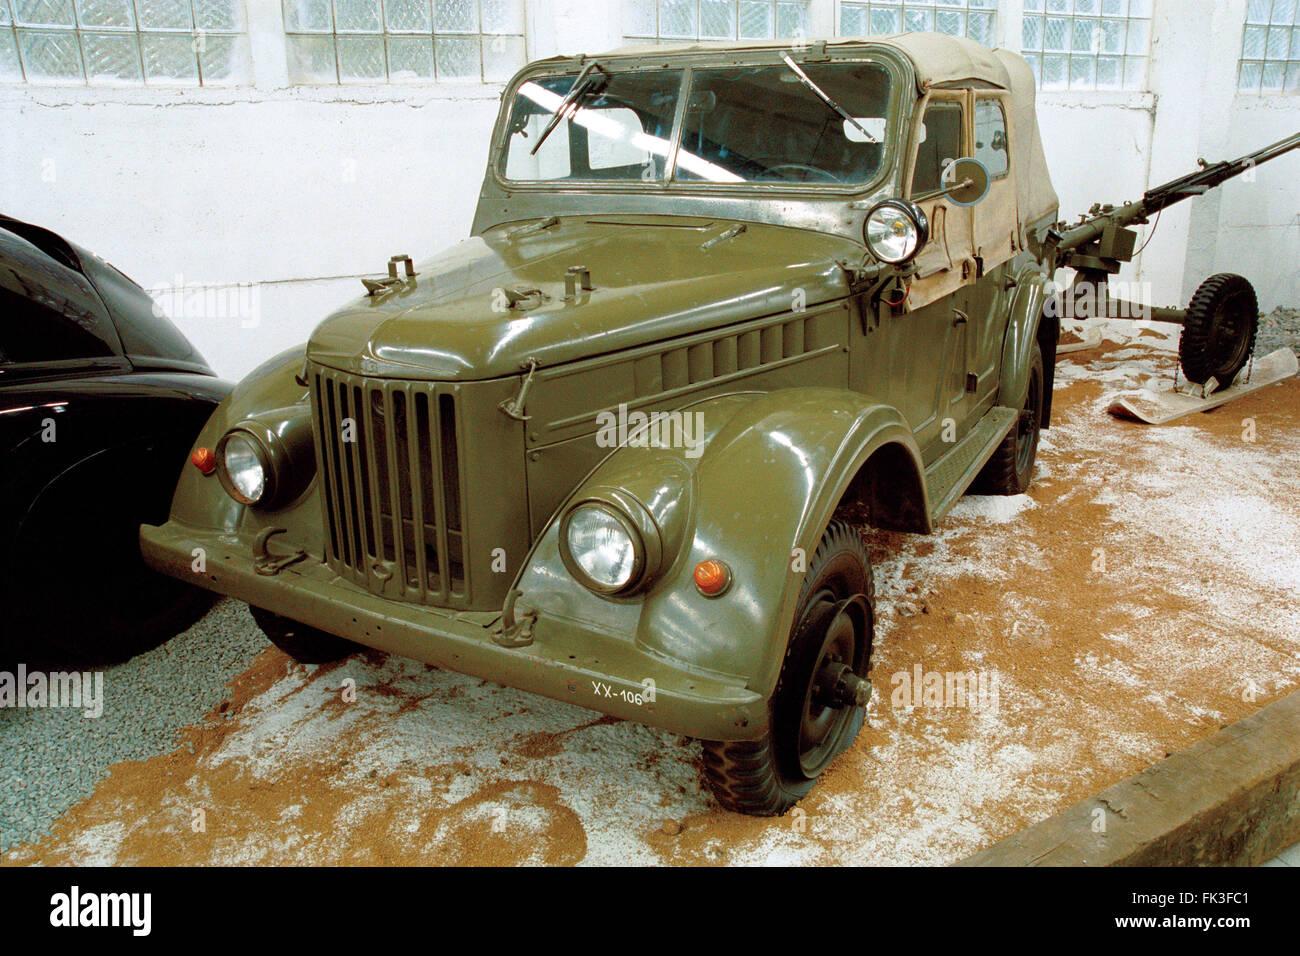 sowjetische milit rische gel ndewagen uaz 469 produziert. Black Bedroom Furniture Sets. Home Design Ideas